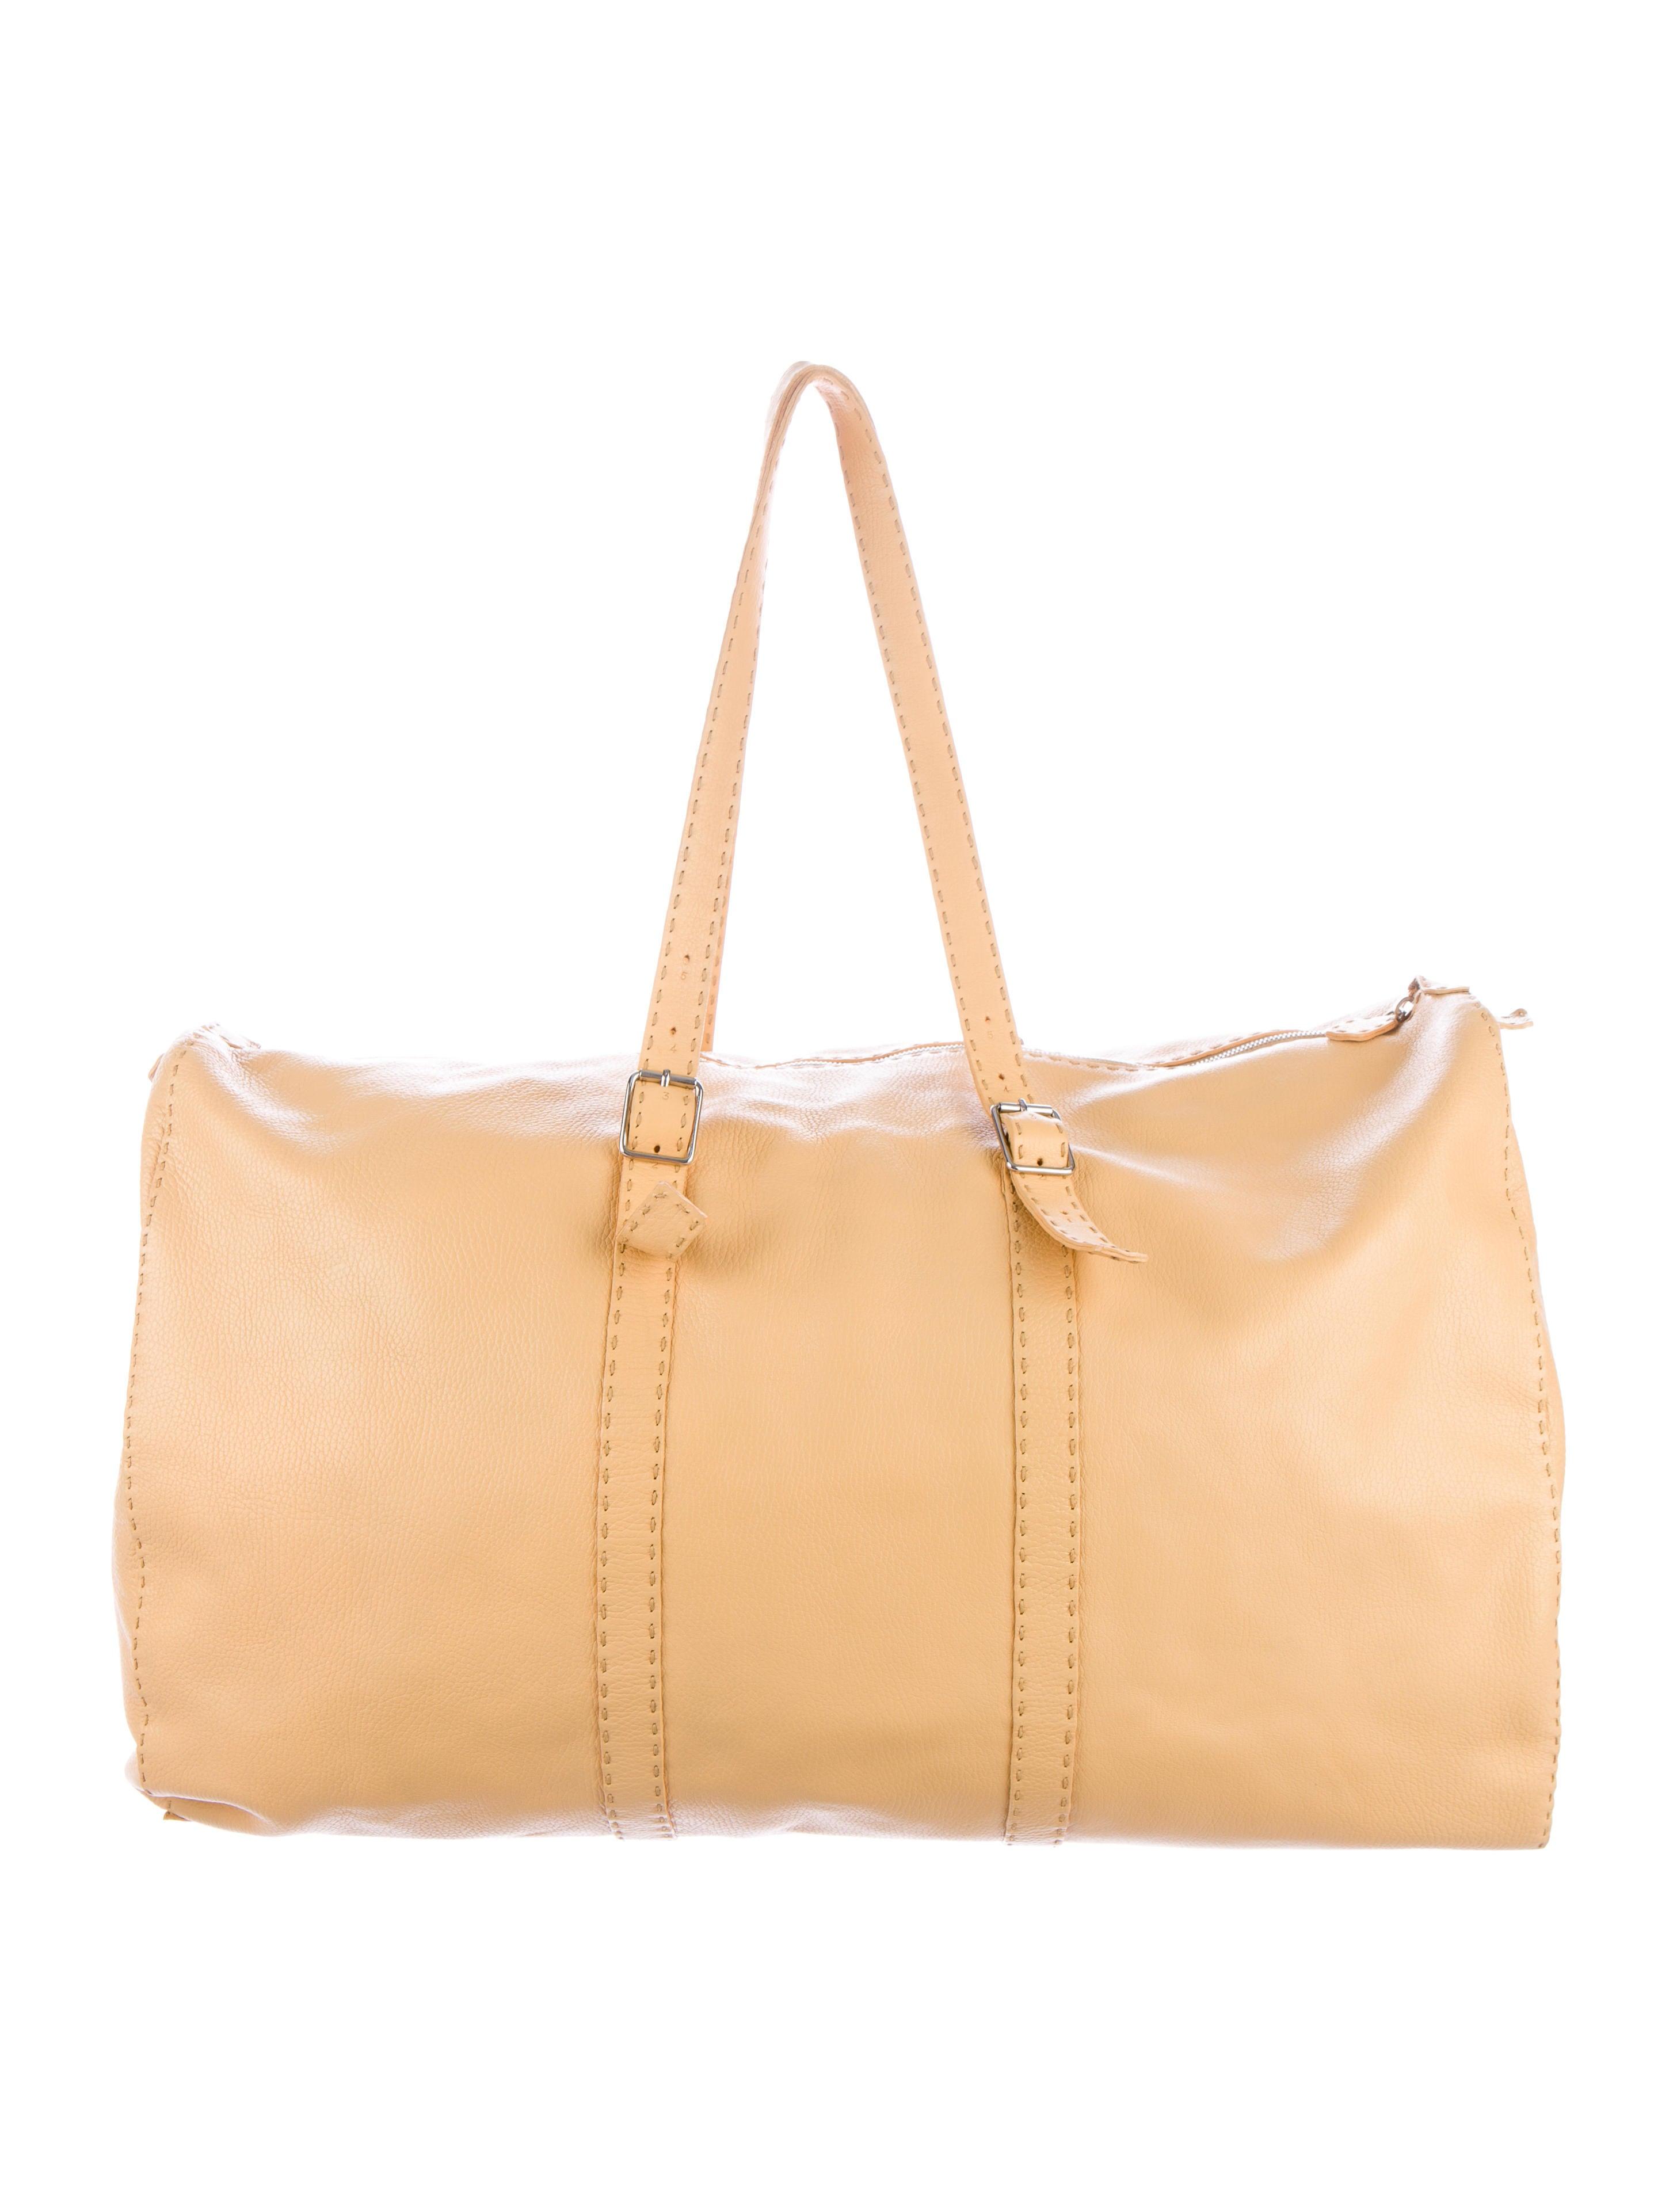 26afc0aaba07 Fendi Selleria Leather Weekender - Handbags - FEN48888